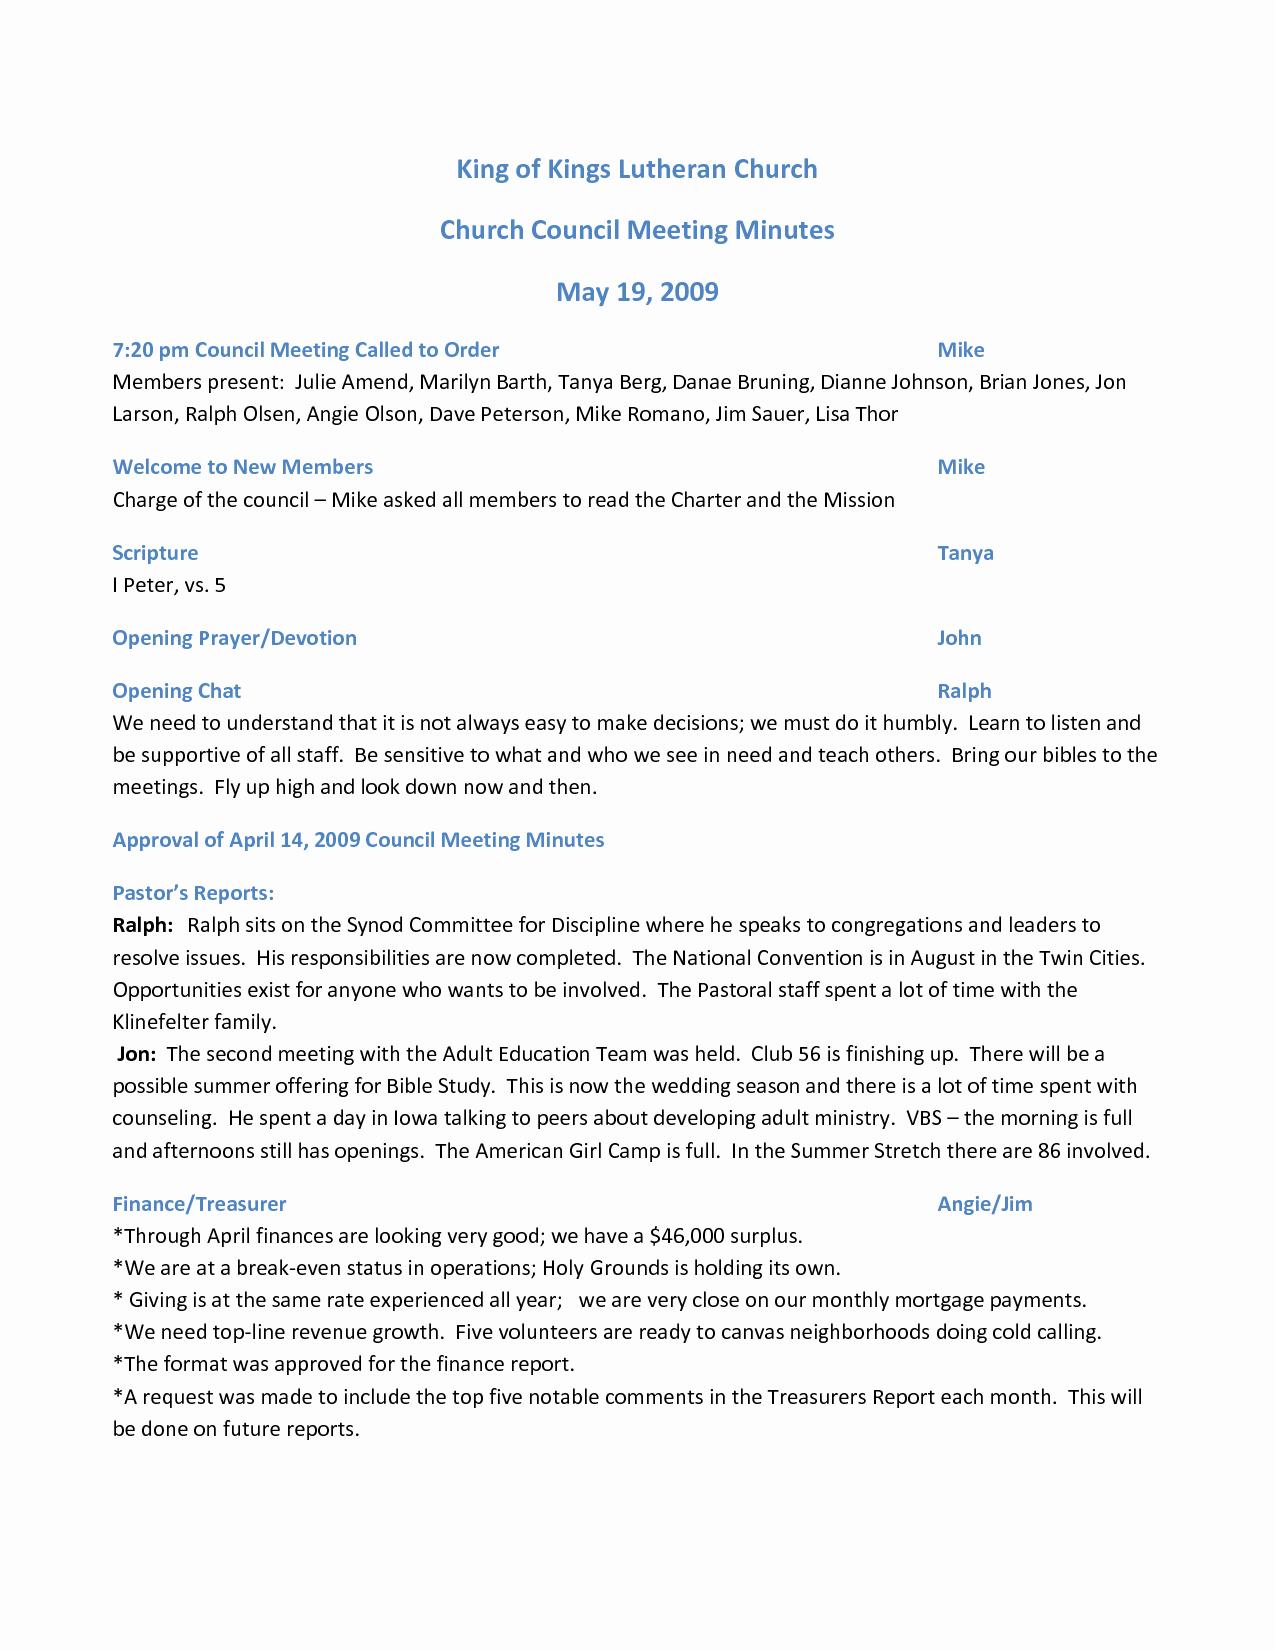 Church Meeting Minutes Template Elegant Best S Of Pentacostal Church Meeting Minutes Template